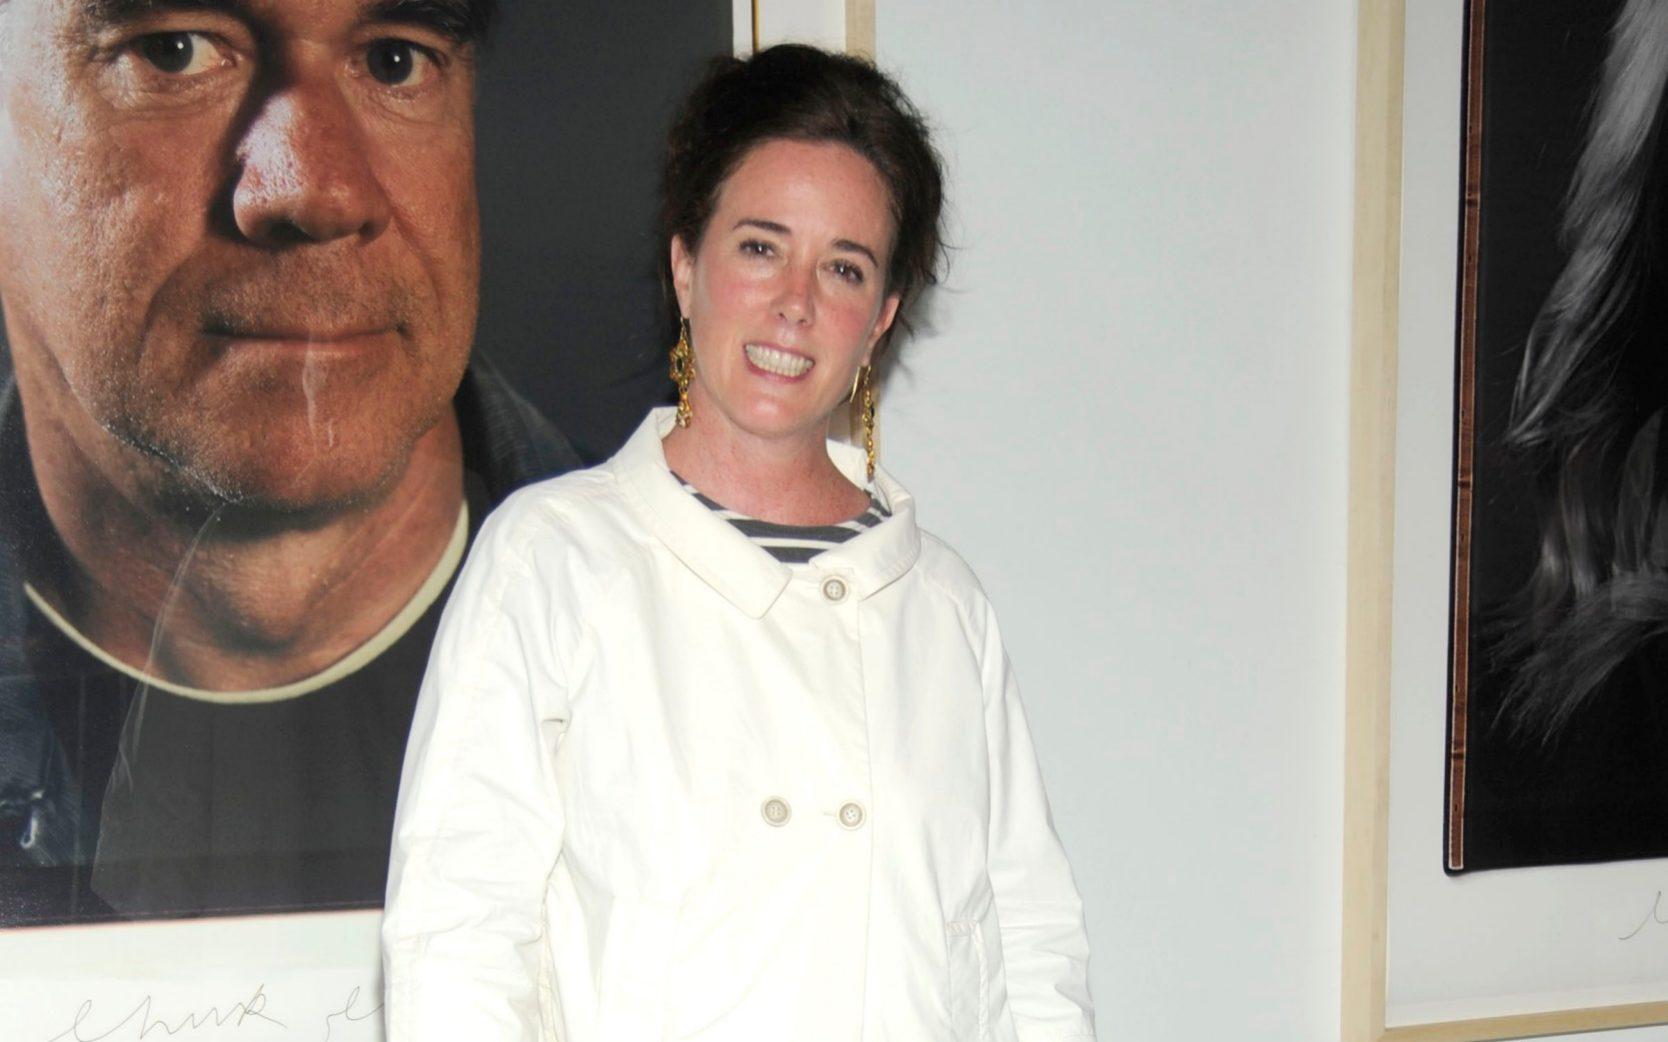 Fashion Designer Kate Spade Found Dead At 55 In Suspected